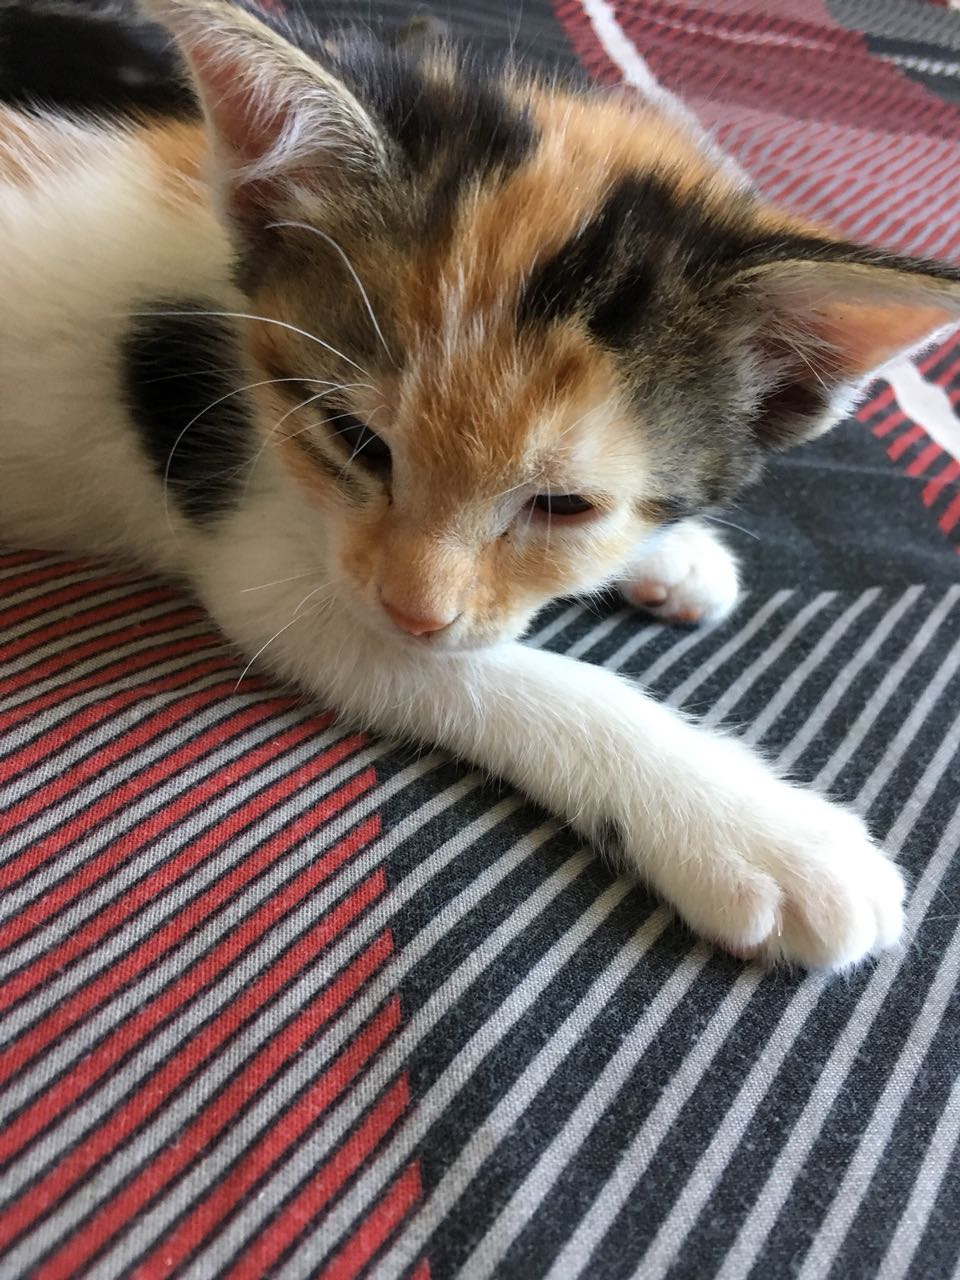 Kittens for sale!